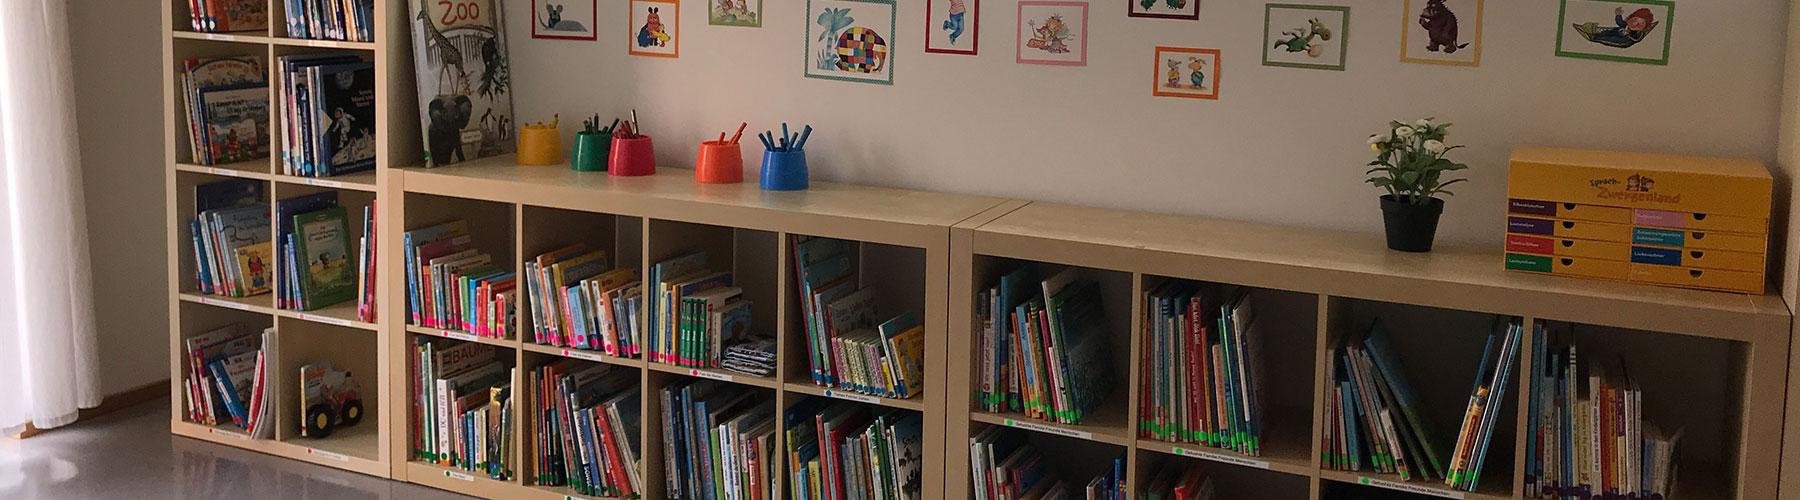 Kindergartenbücherei AWO Norbert Sieben